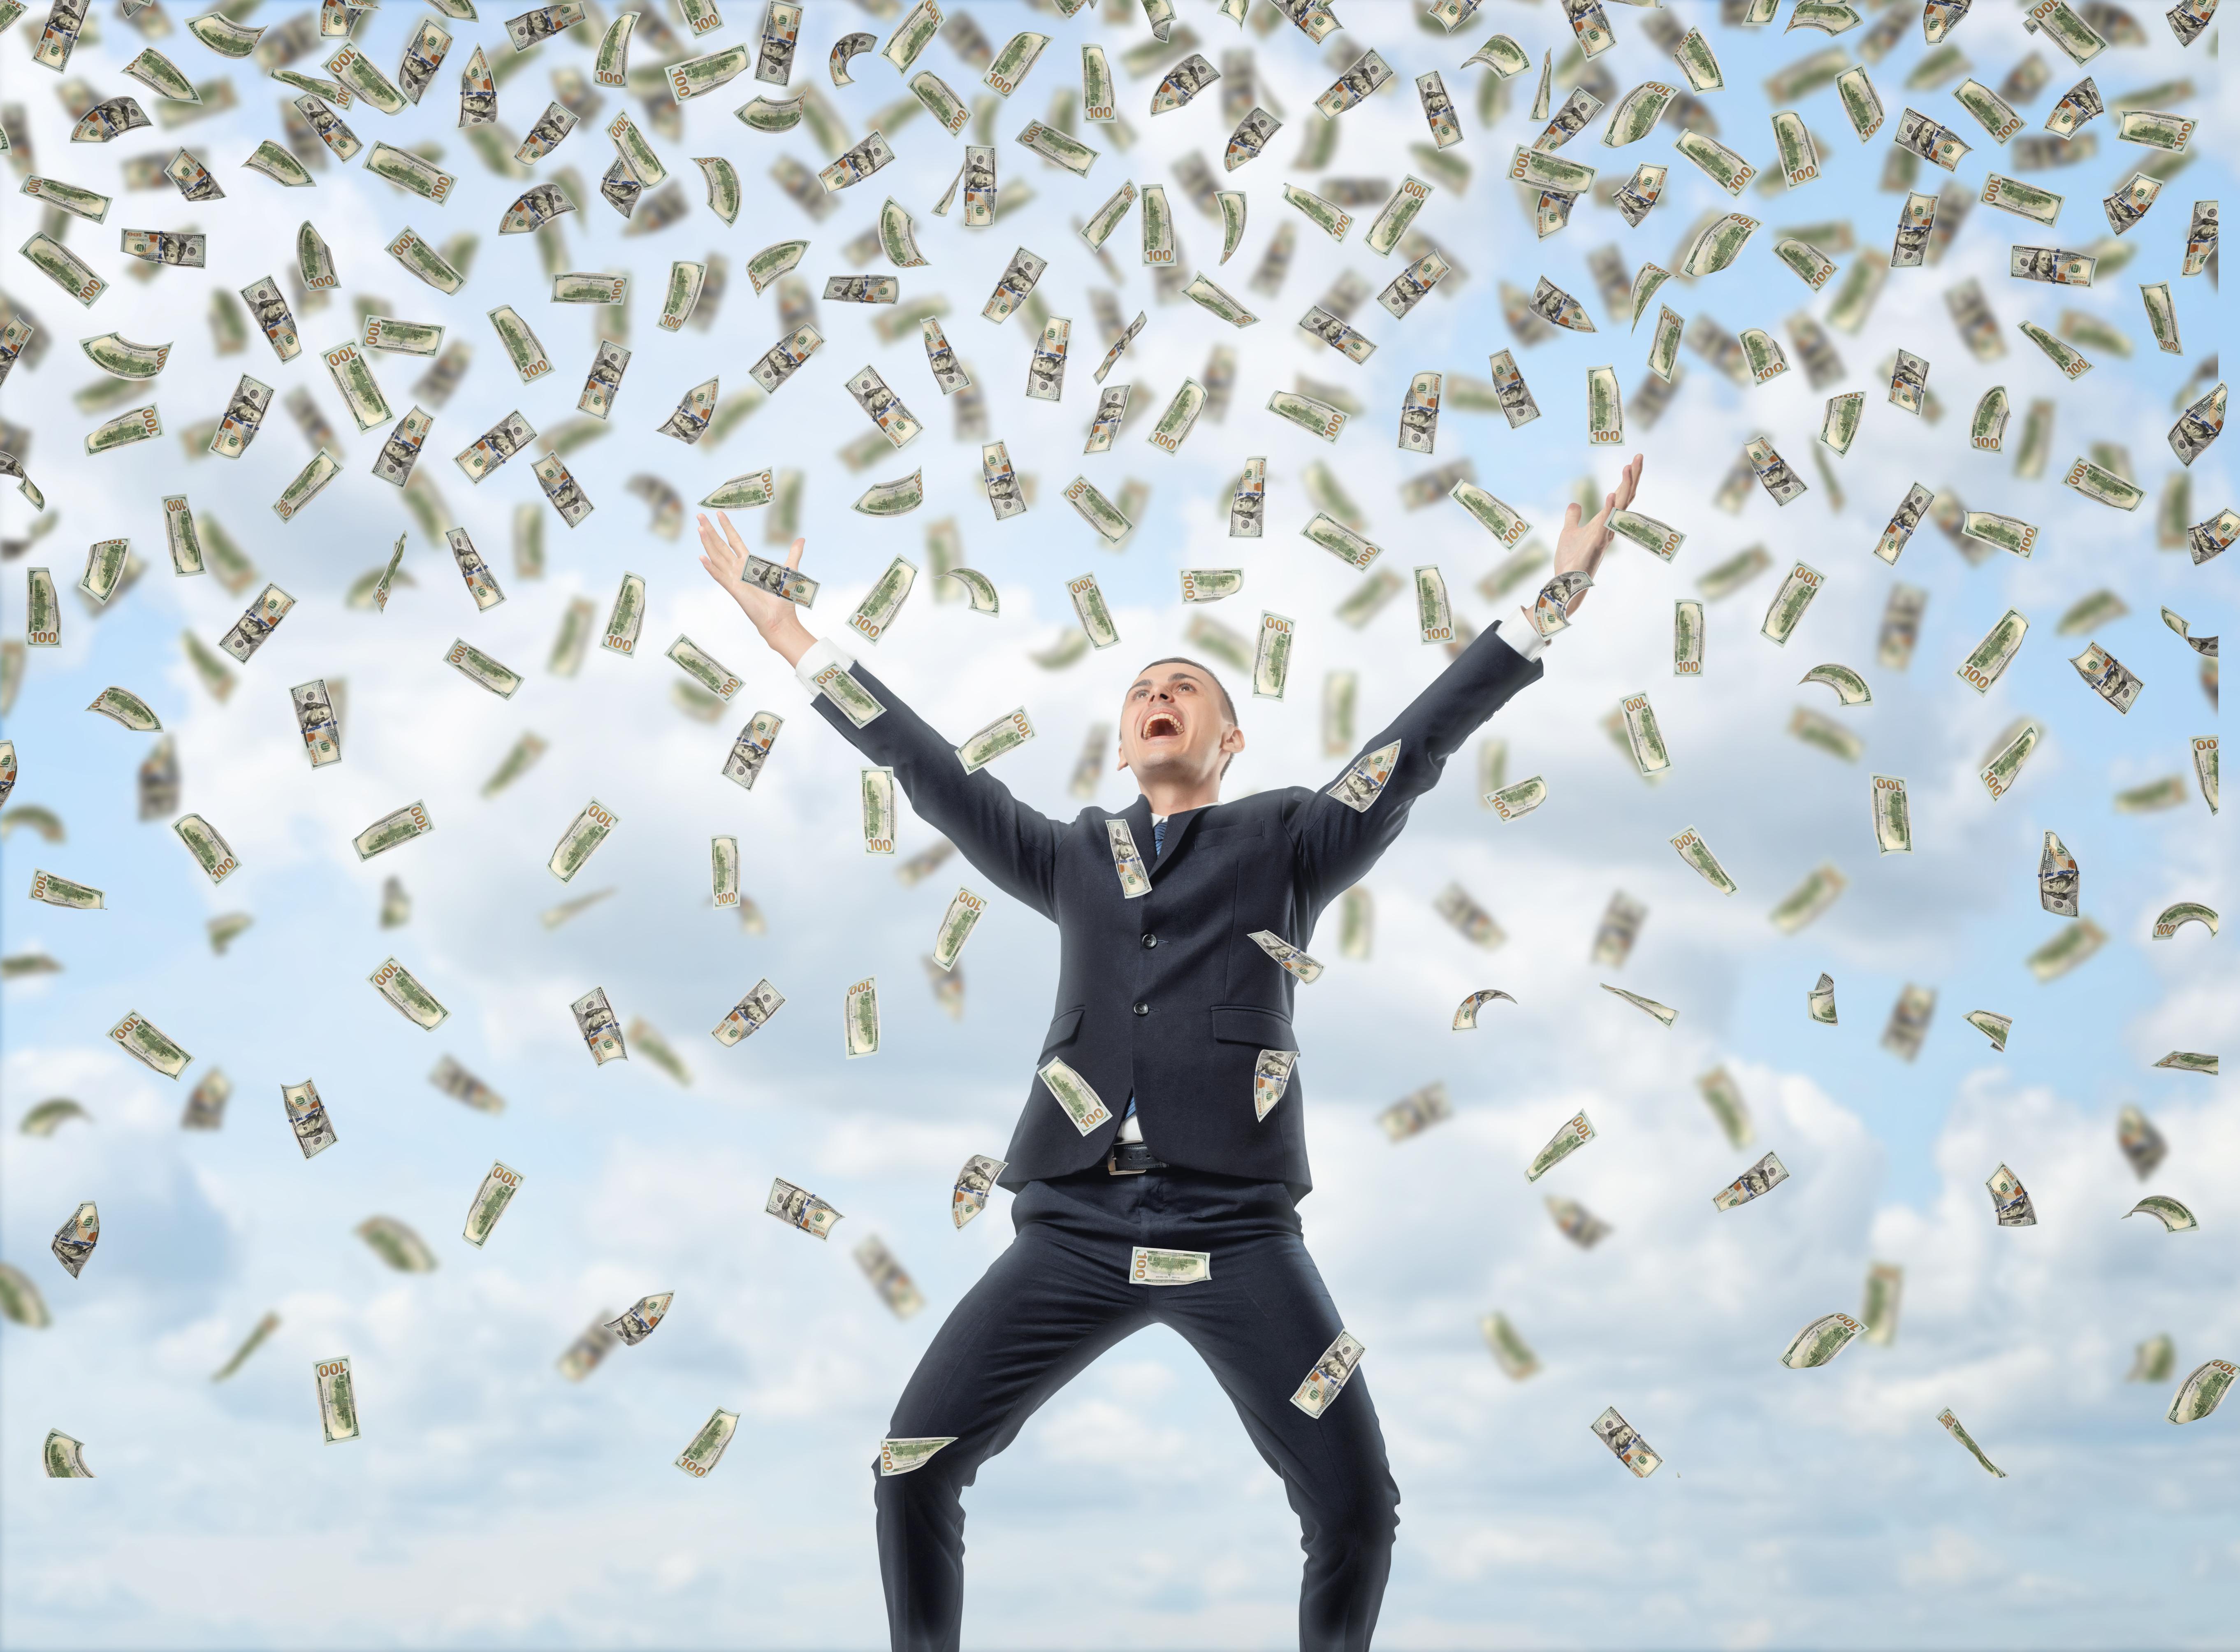 raining money on a business man